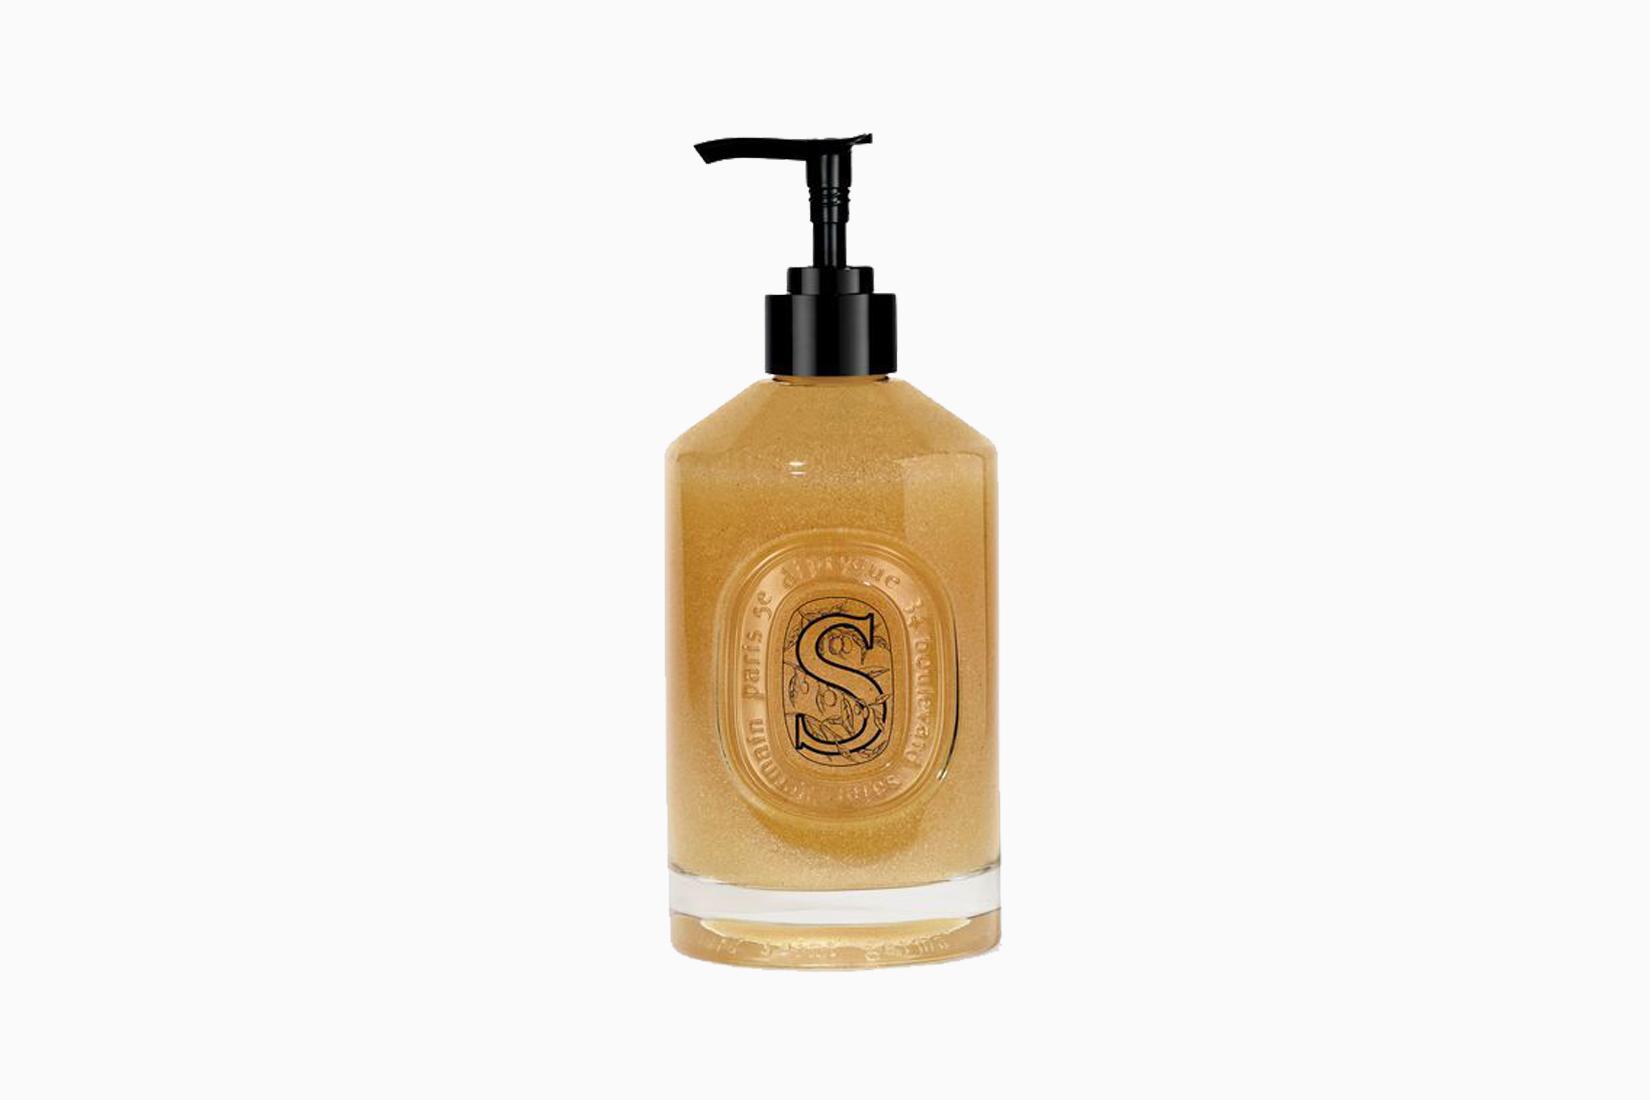 best hand soap diptyque review - Luxe Digital